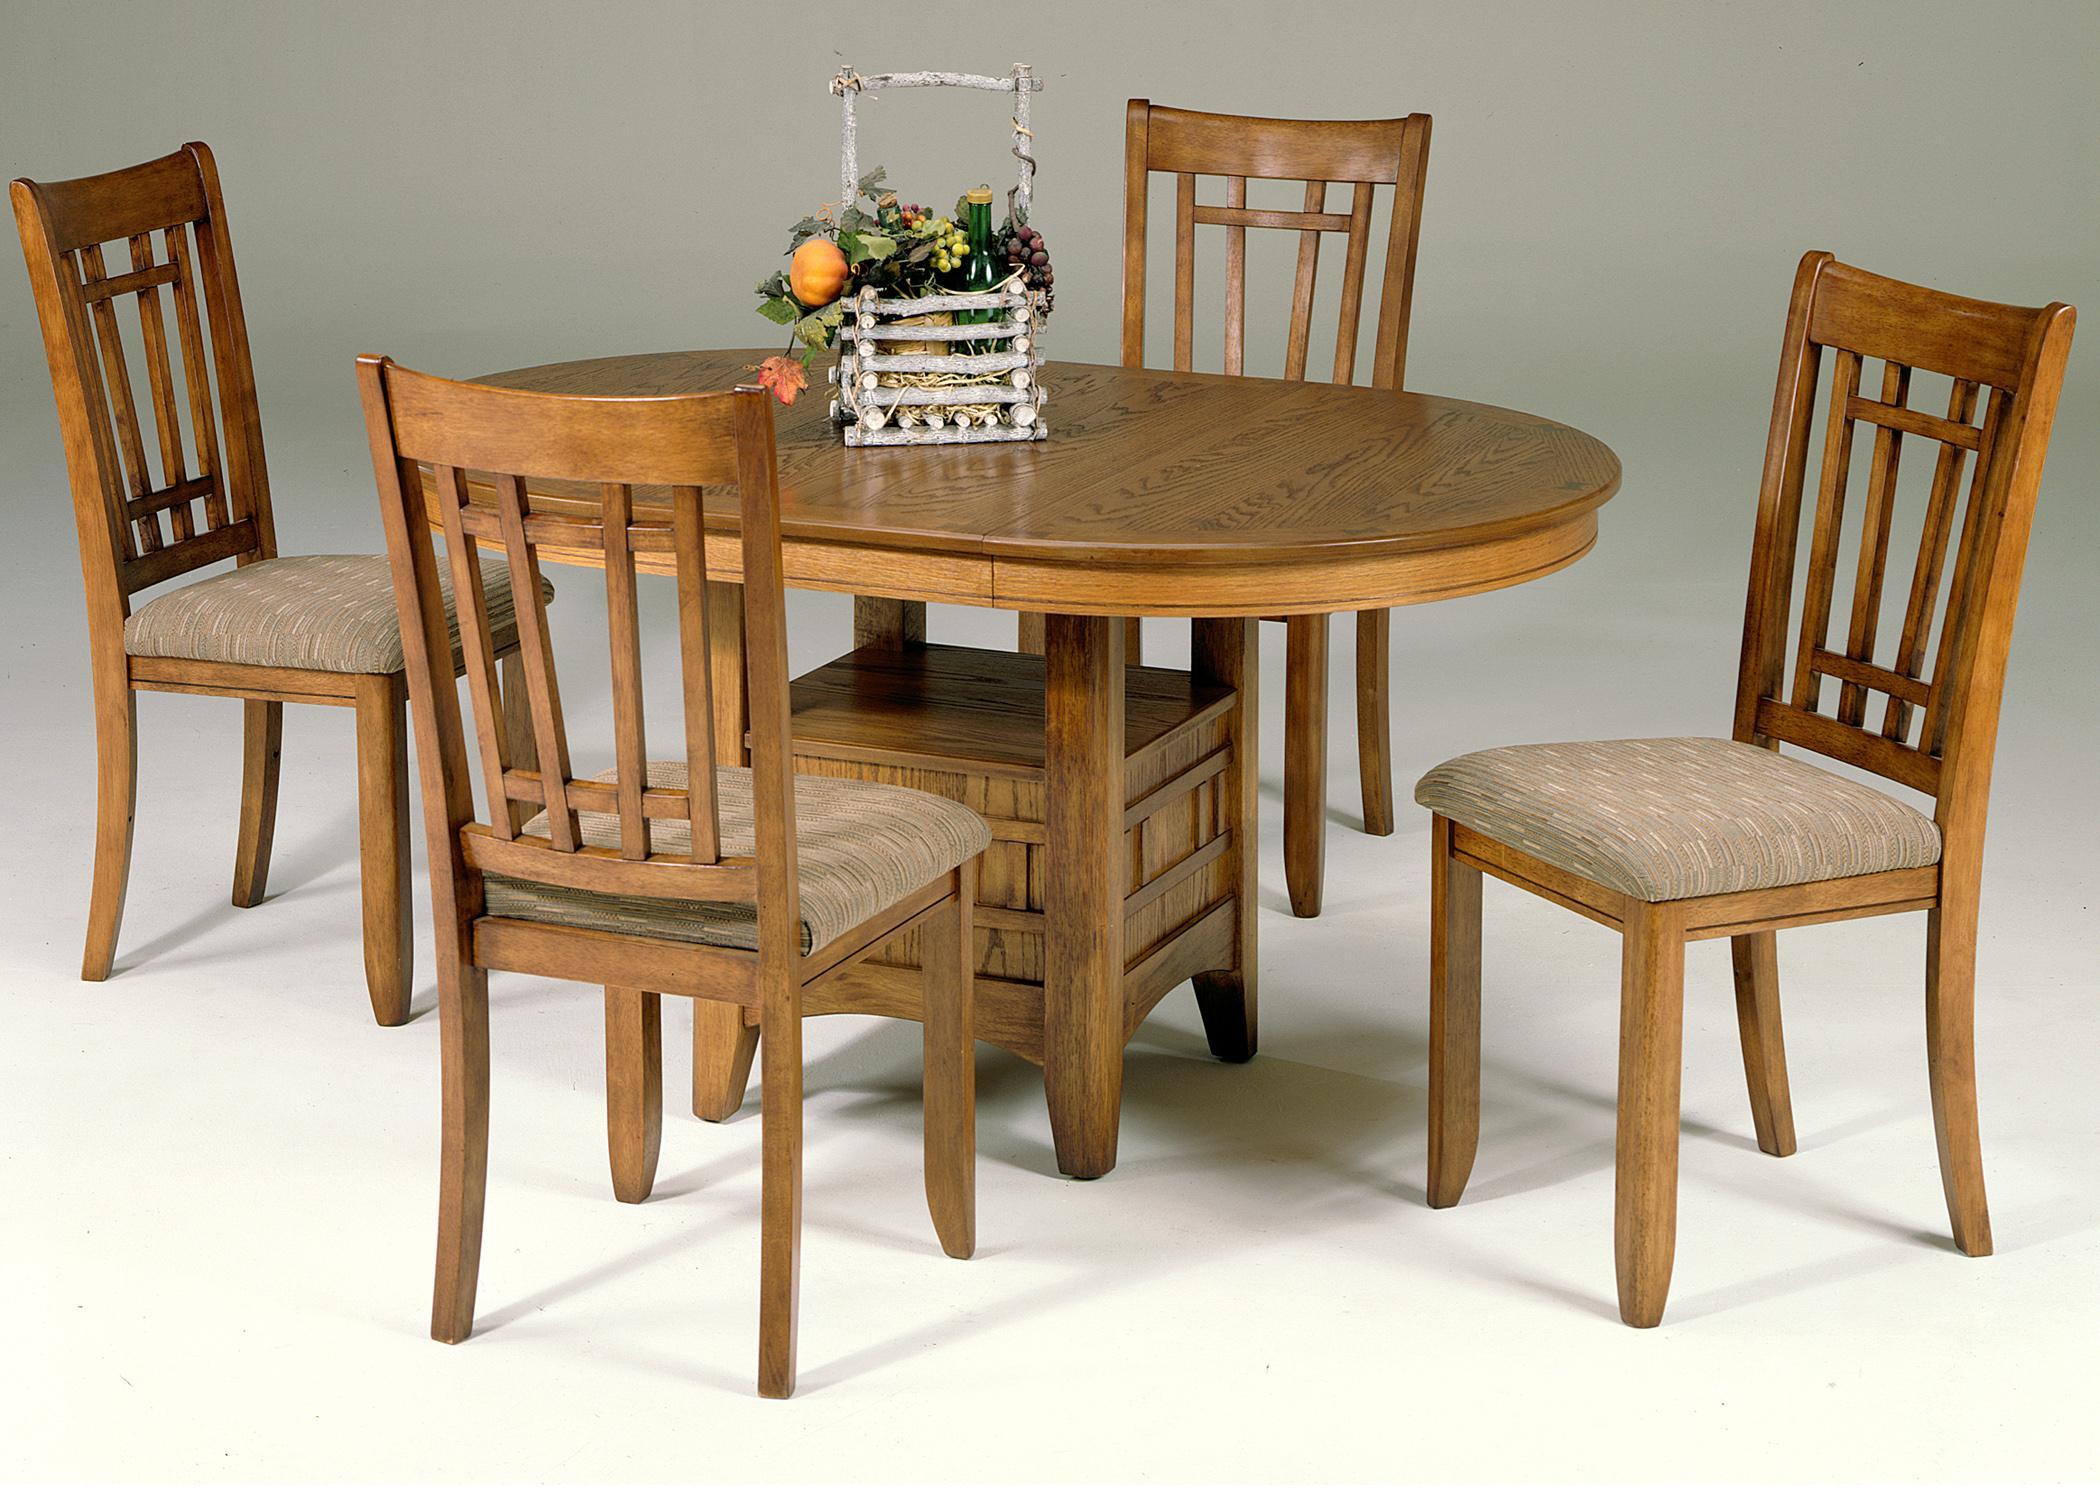 Liberty Furniture Santa Rosa 5 Piece Pedestal Table